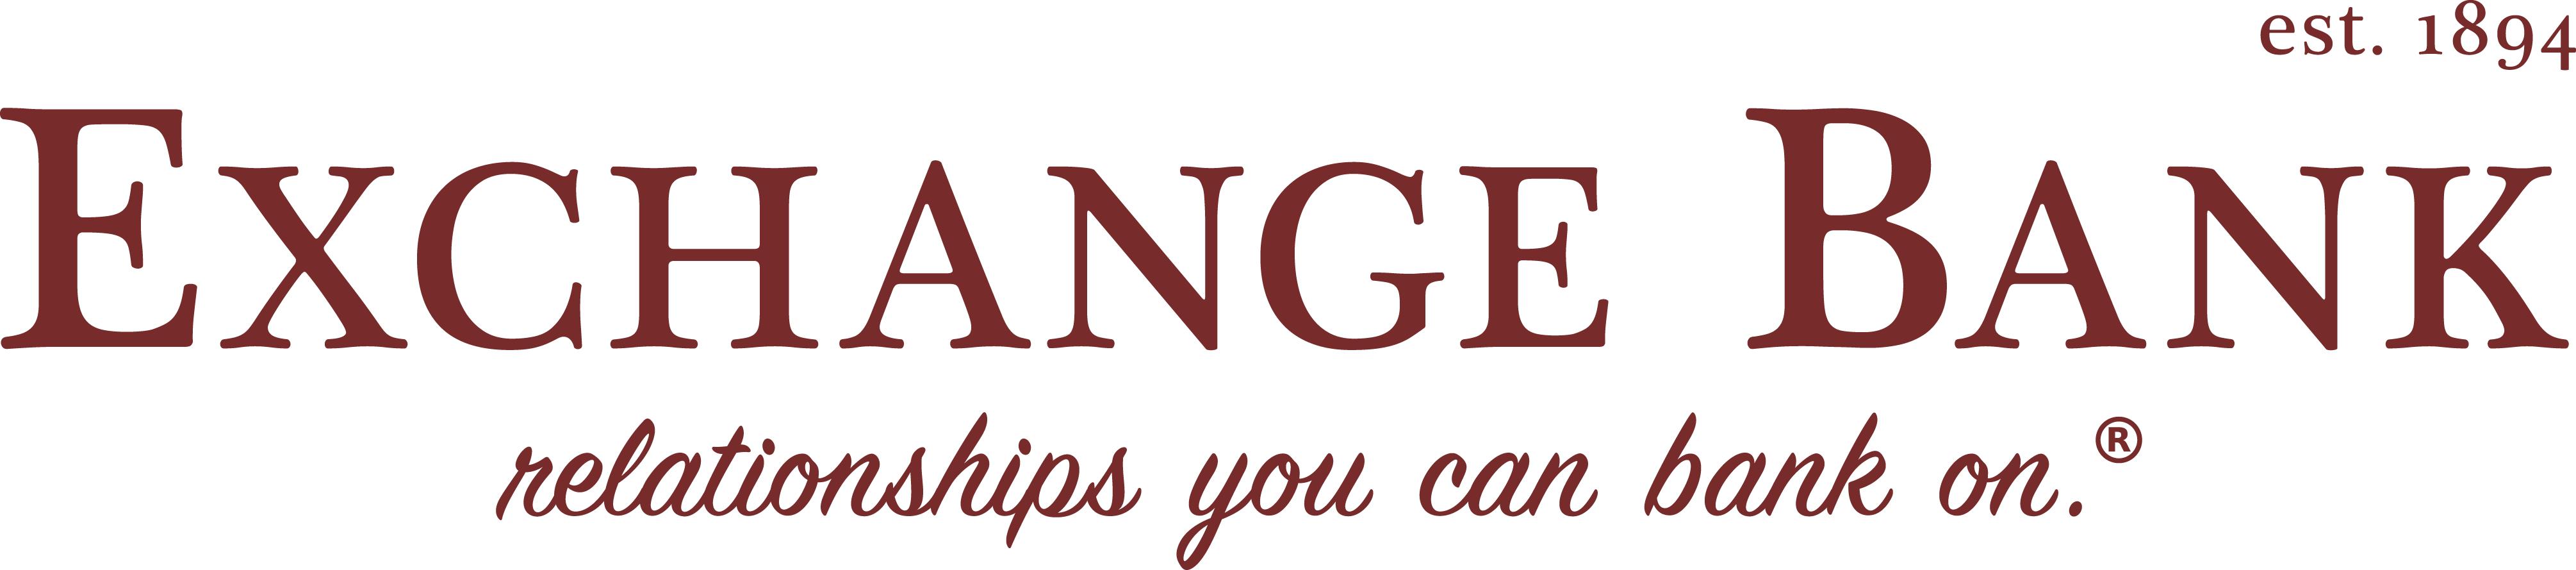 Exchange banking